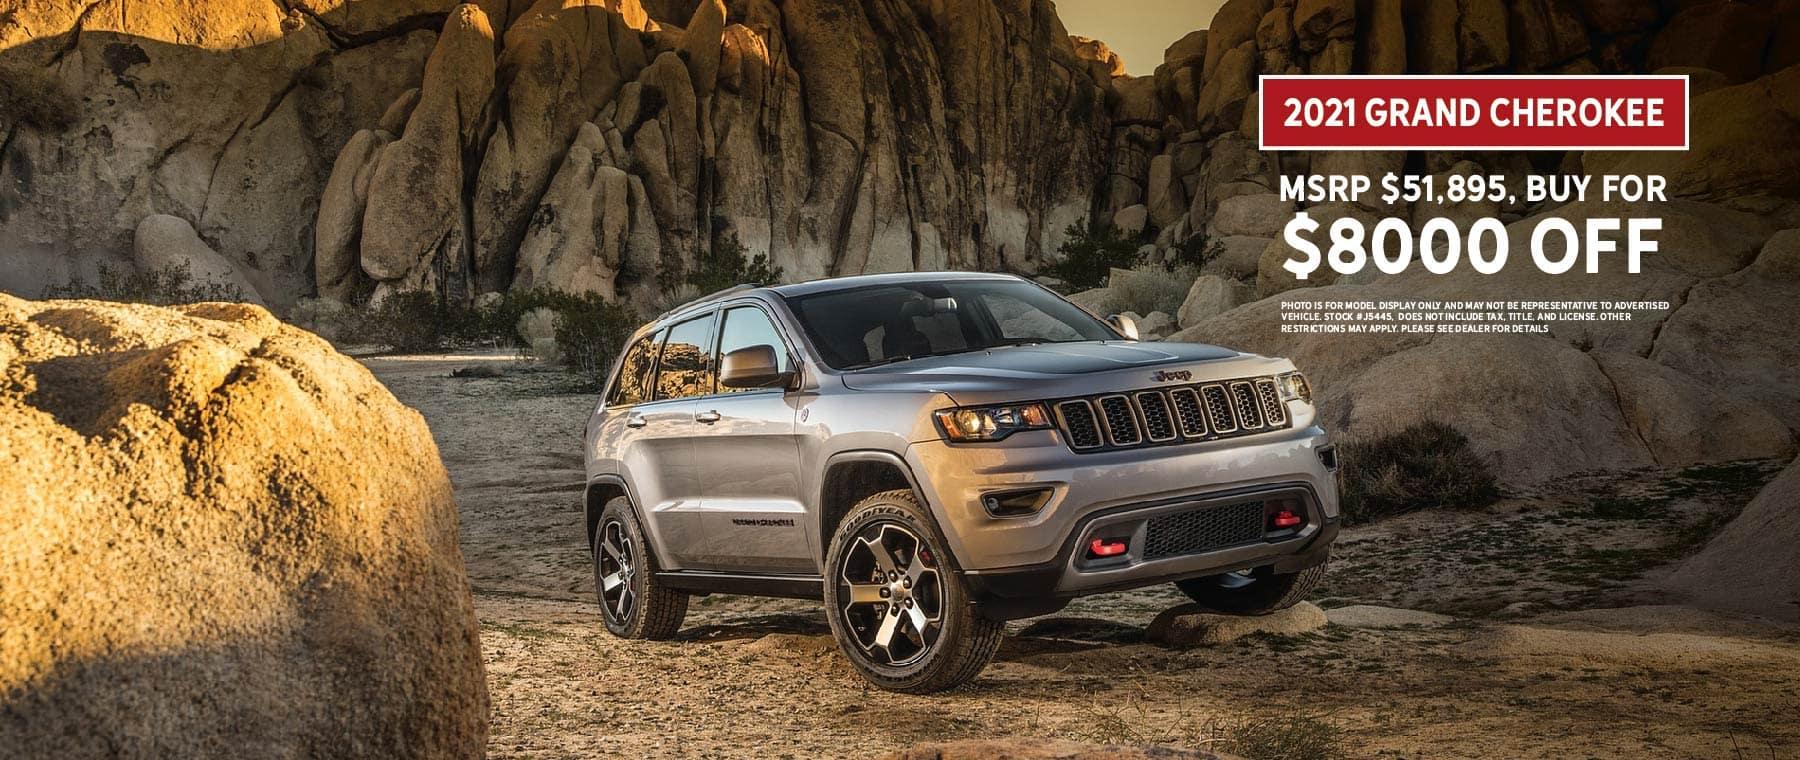 2021.03.10 – CDJRP – Jeep G Cherokee Banner-01